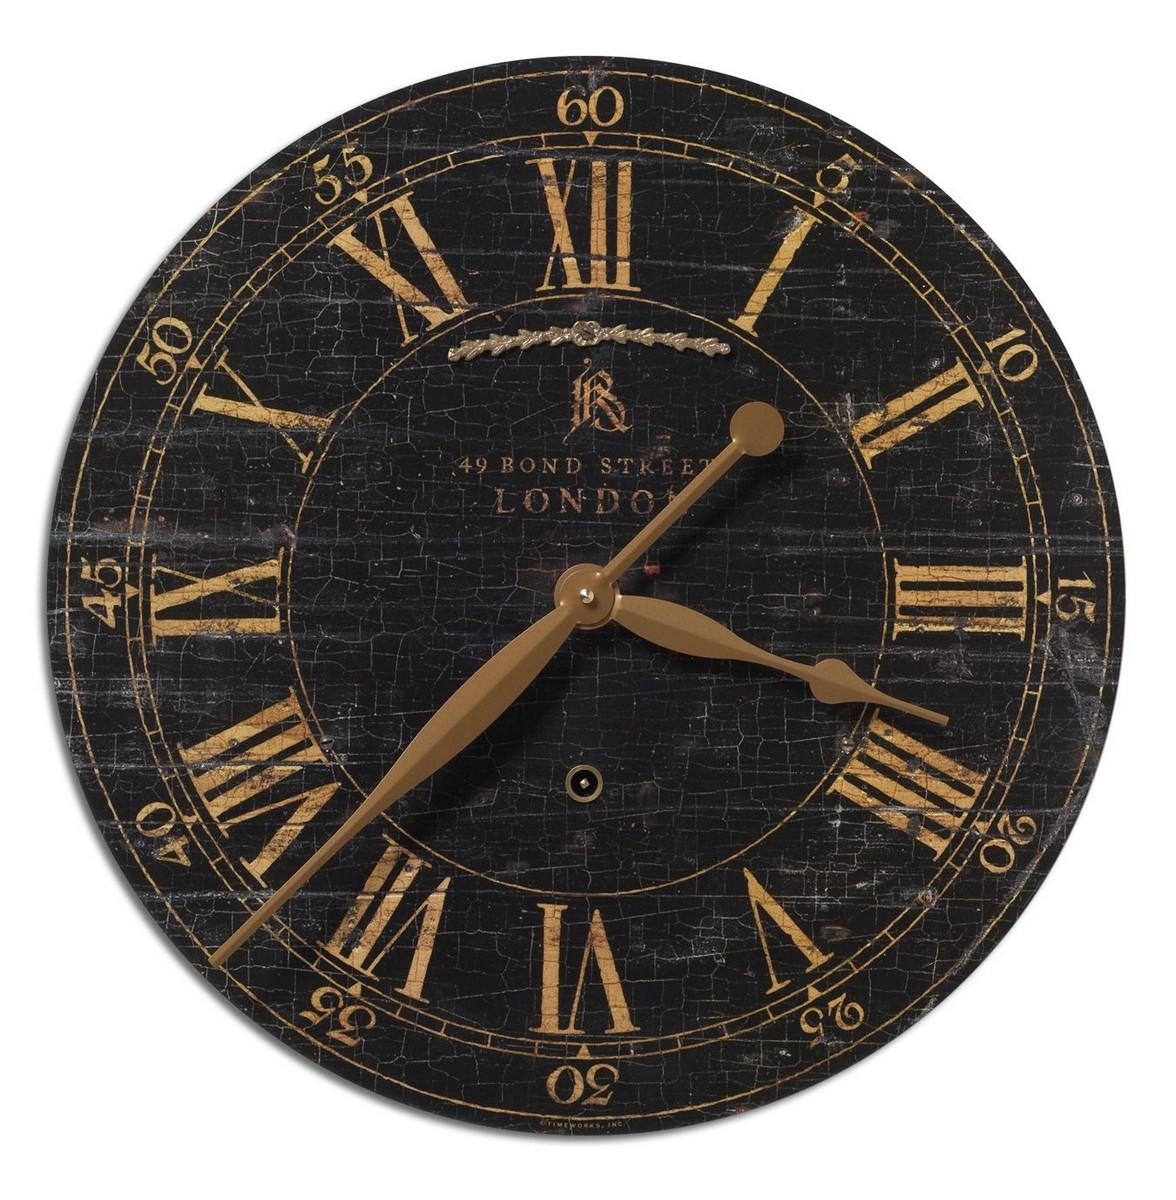 Uttermost Bond Street 18 Black Wall Clock